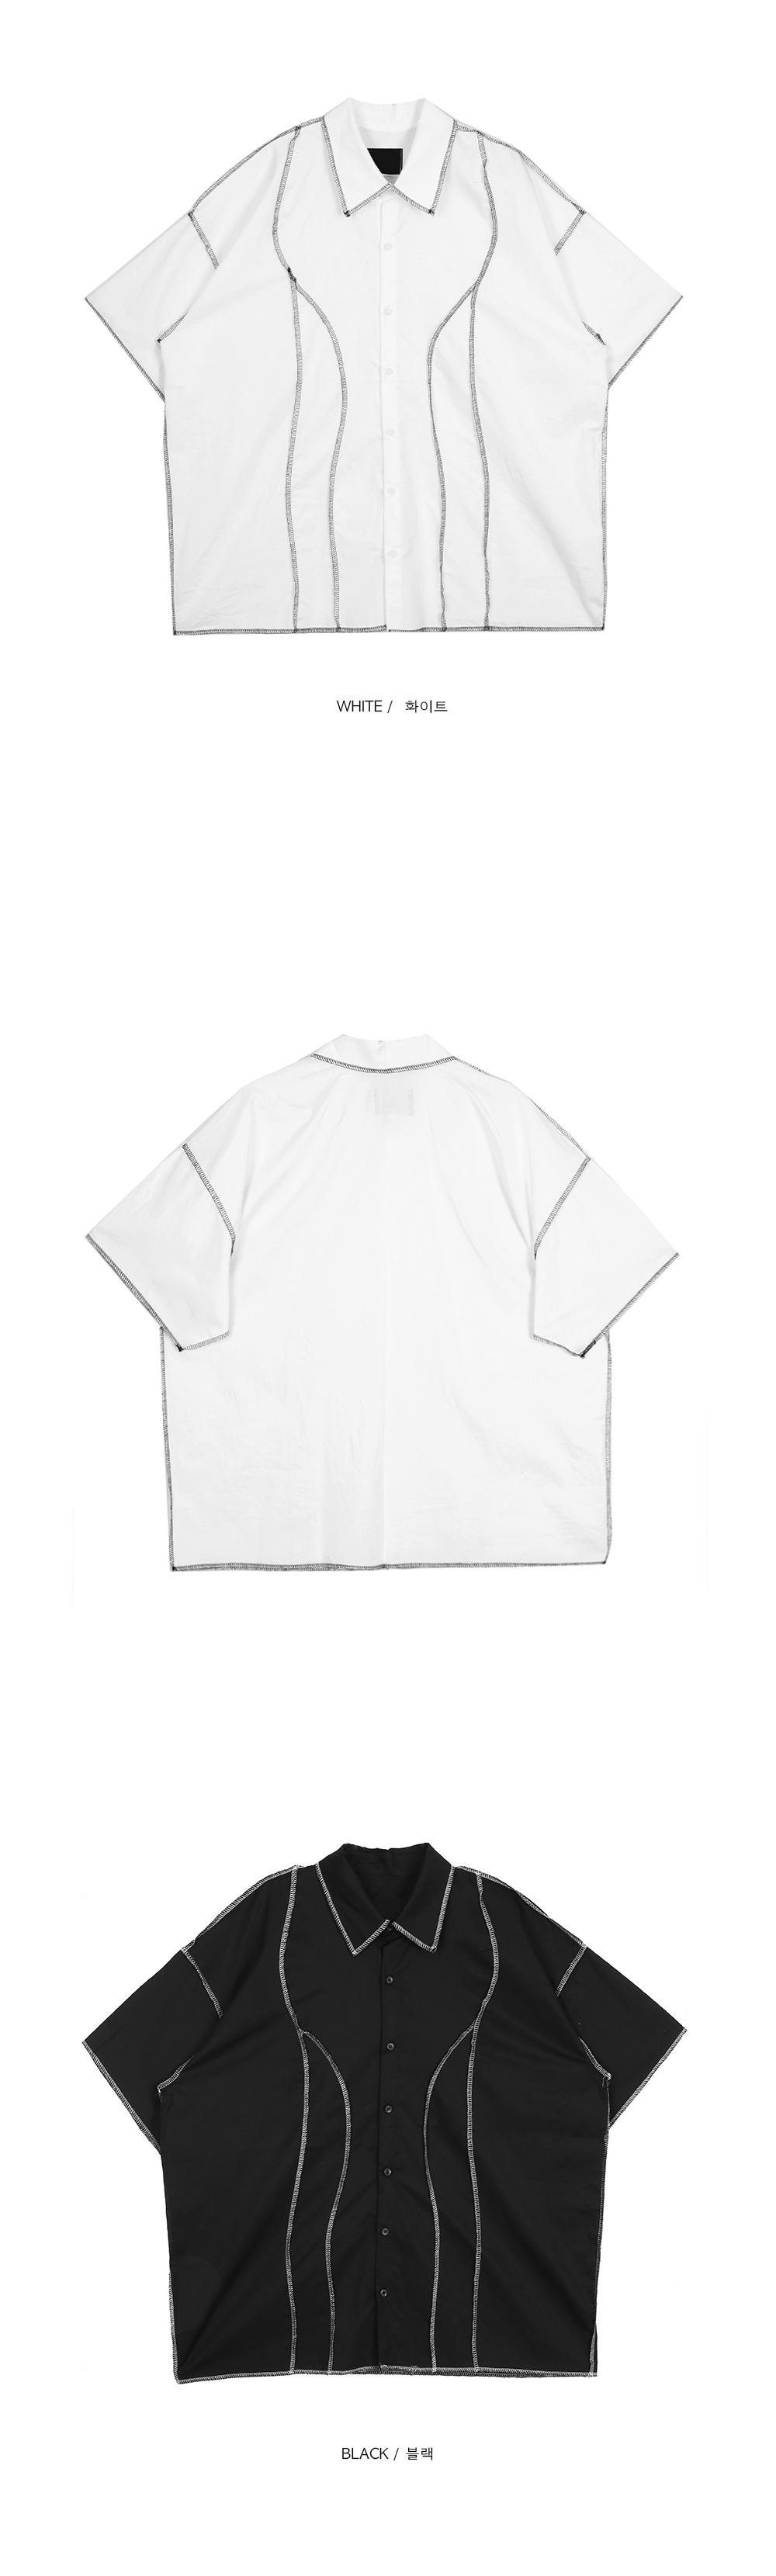 overlock 1/2 shirts - men